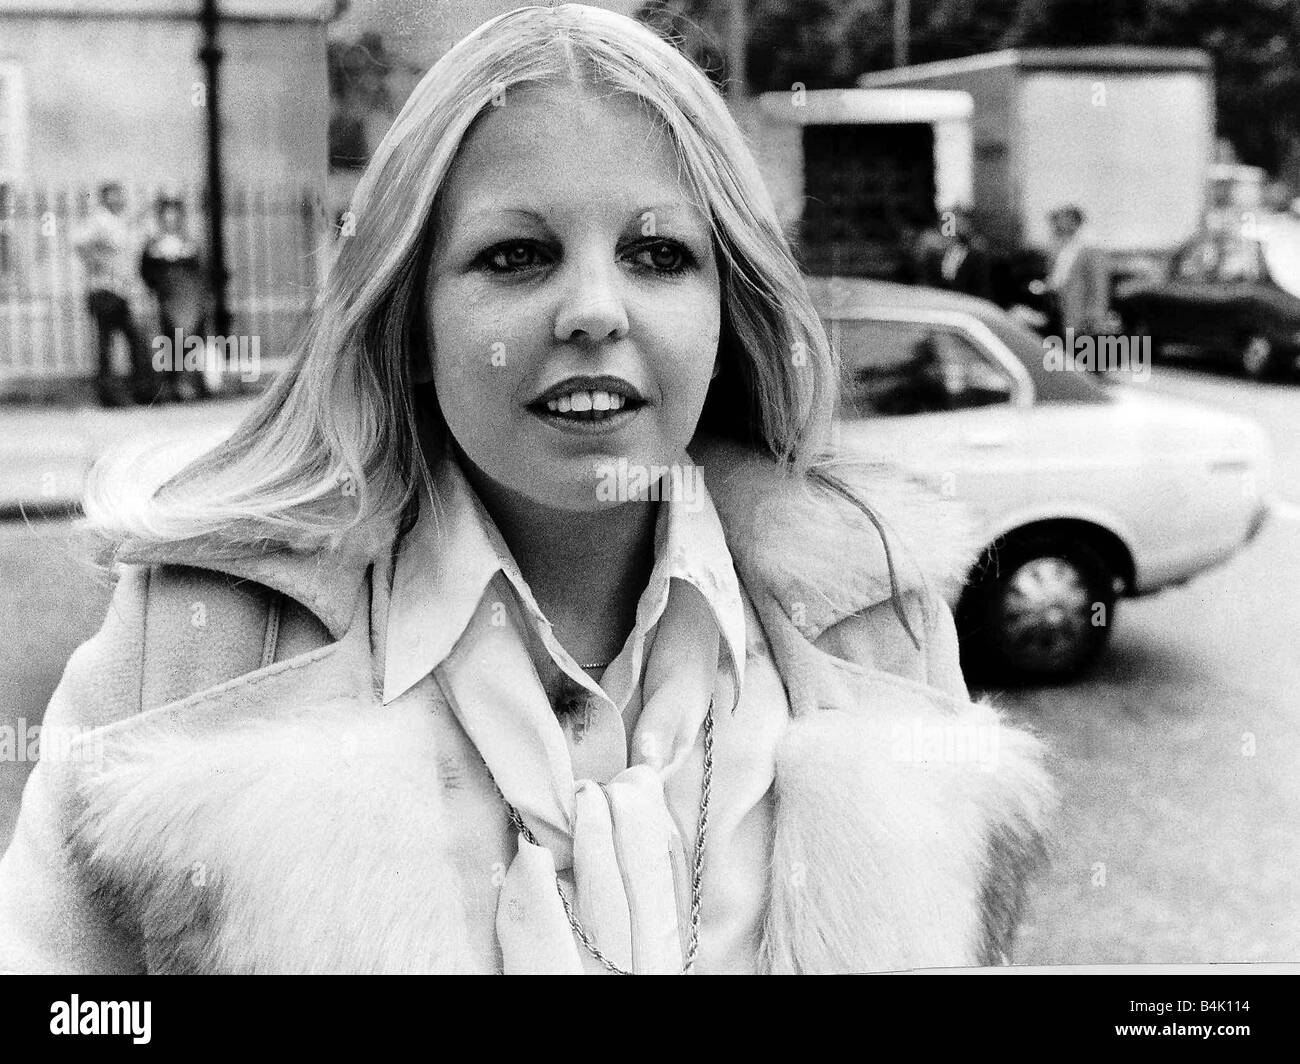 Brandy Norwood born February 11, 1979 (age 39),Vondell Darr Sex gallery Karmen Pedaru EST 2011,Nancy Opel